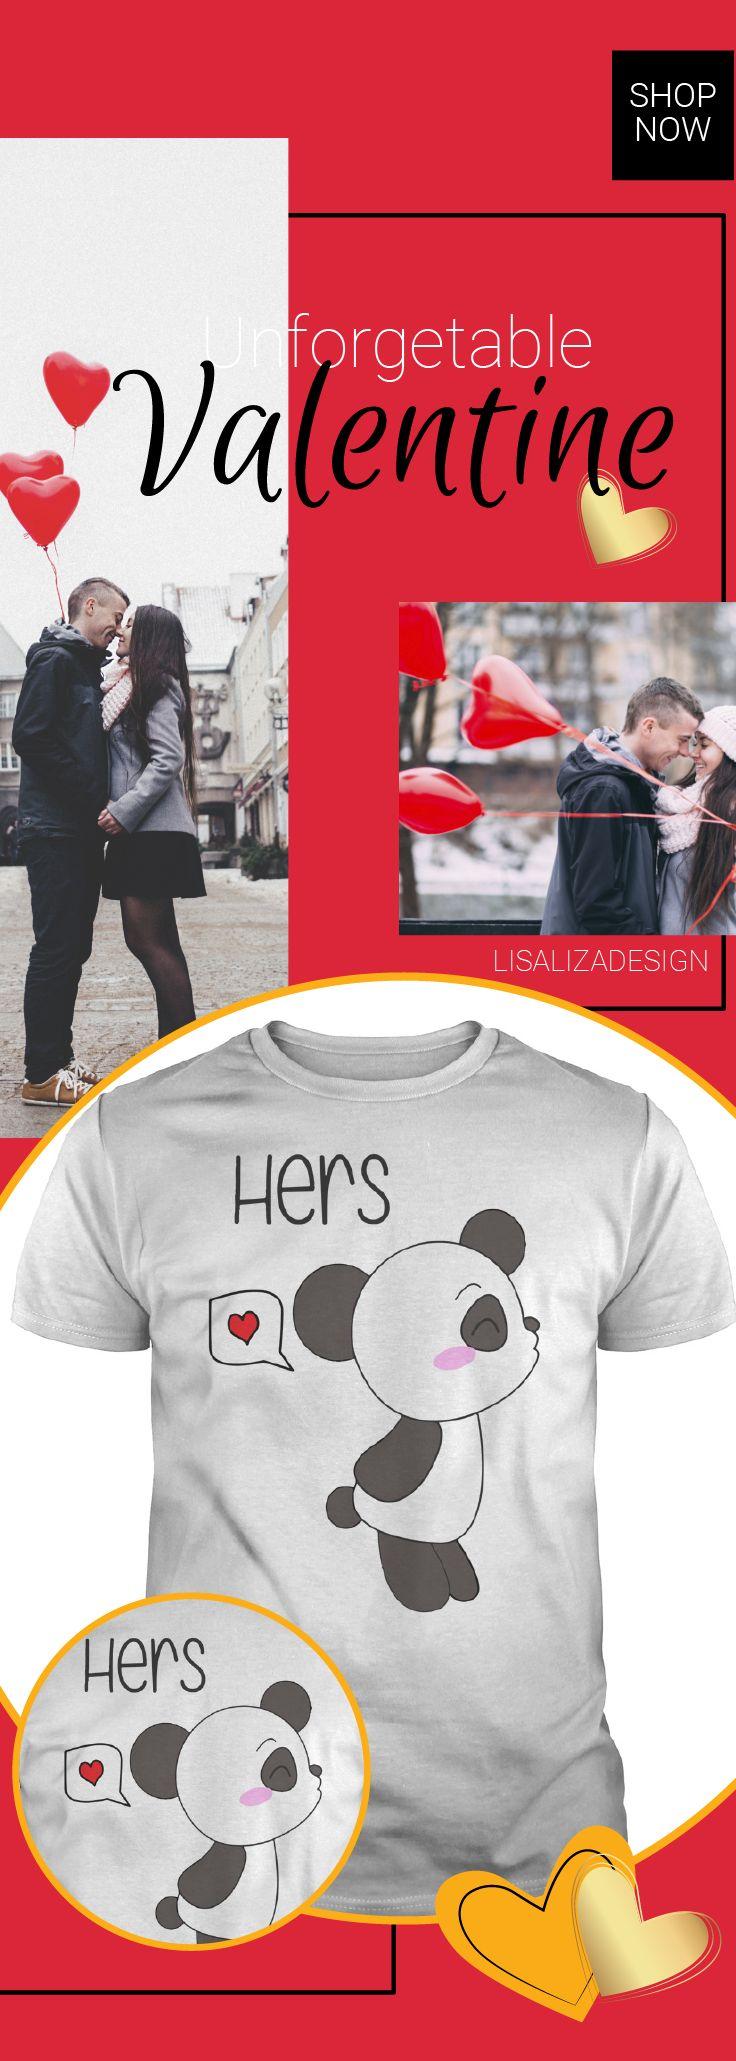 Couple her PANDA Valentine Animal Dad Mom Lady Man Woman Men Women Girl Boy.  Sunfrog Women/ Men  T Shirt / Hoodies  Love is in the air . Be My Valentine.  Shop for Darling Valentine TShirt from here.  #valentine  #valentinegift #lover #couple   #inlove #forhim #forher #valentineday #romantic  #sunfrog #lisaliza #giftideas #present #ideas #february   #love #boyfriend #girlfriend #valentineideas